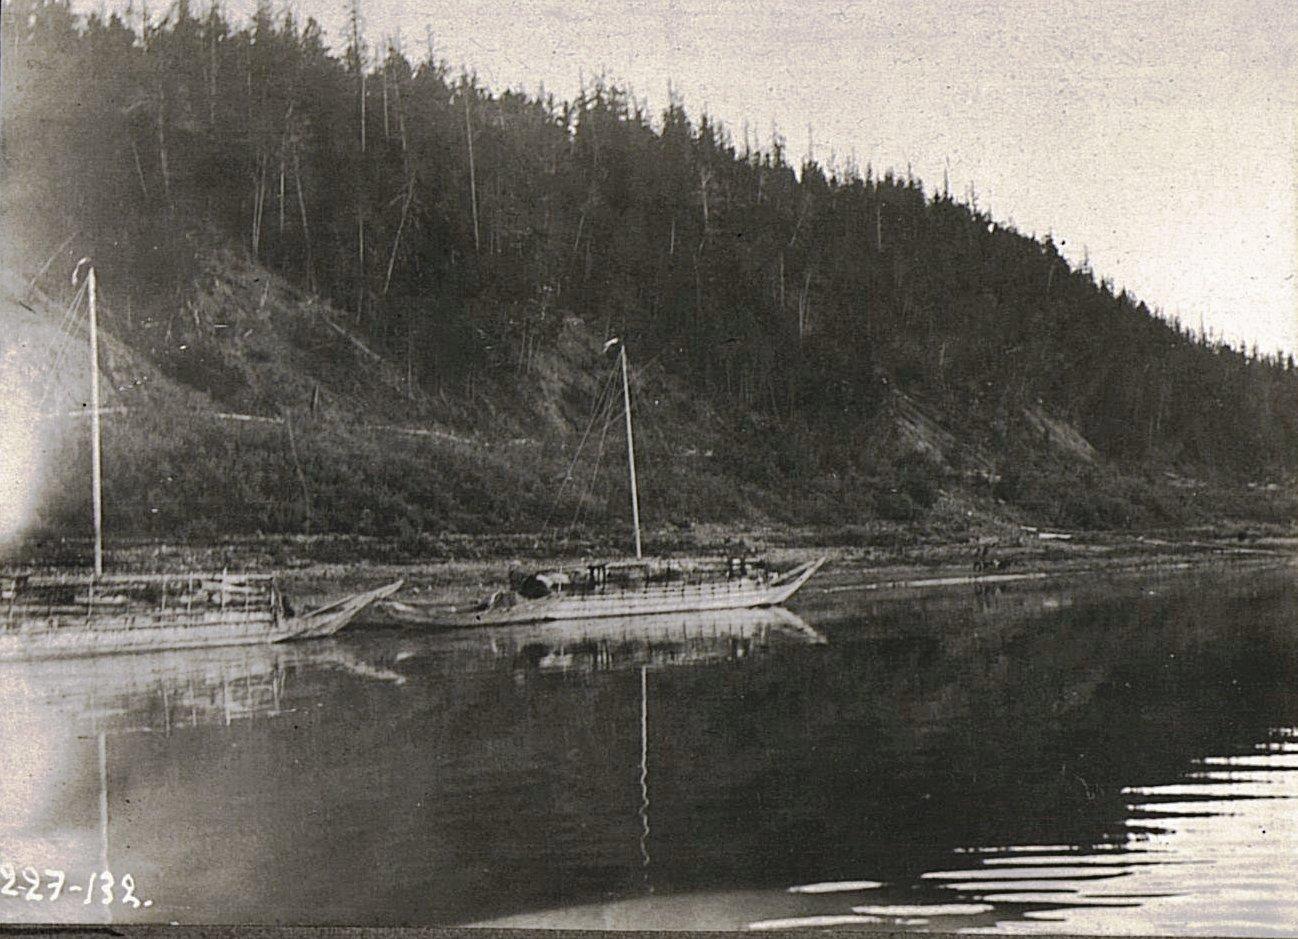 Лодку, идущую против течения, тянут люди и собаки